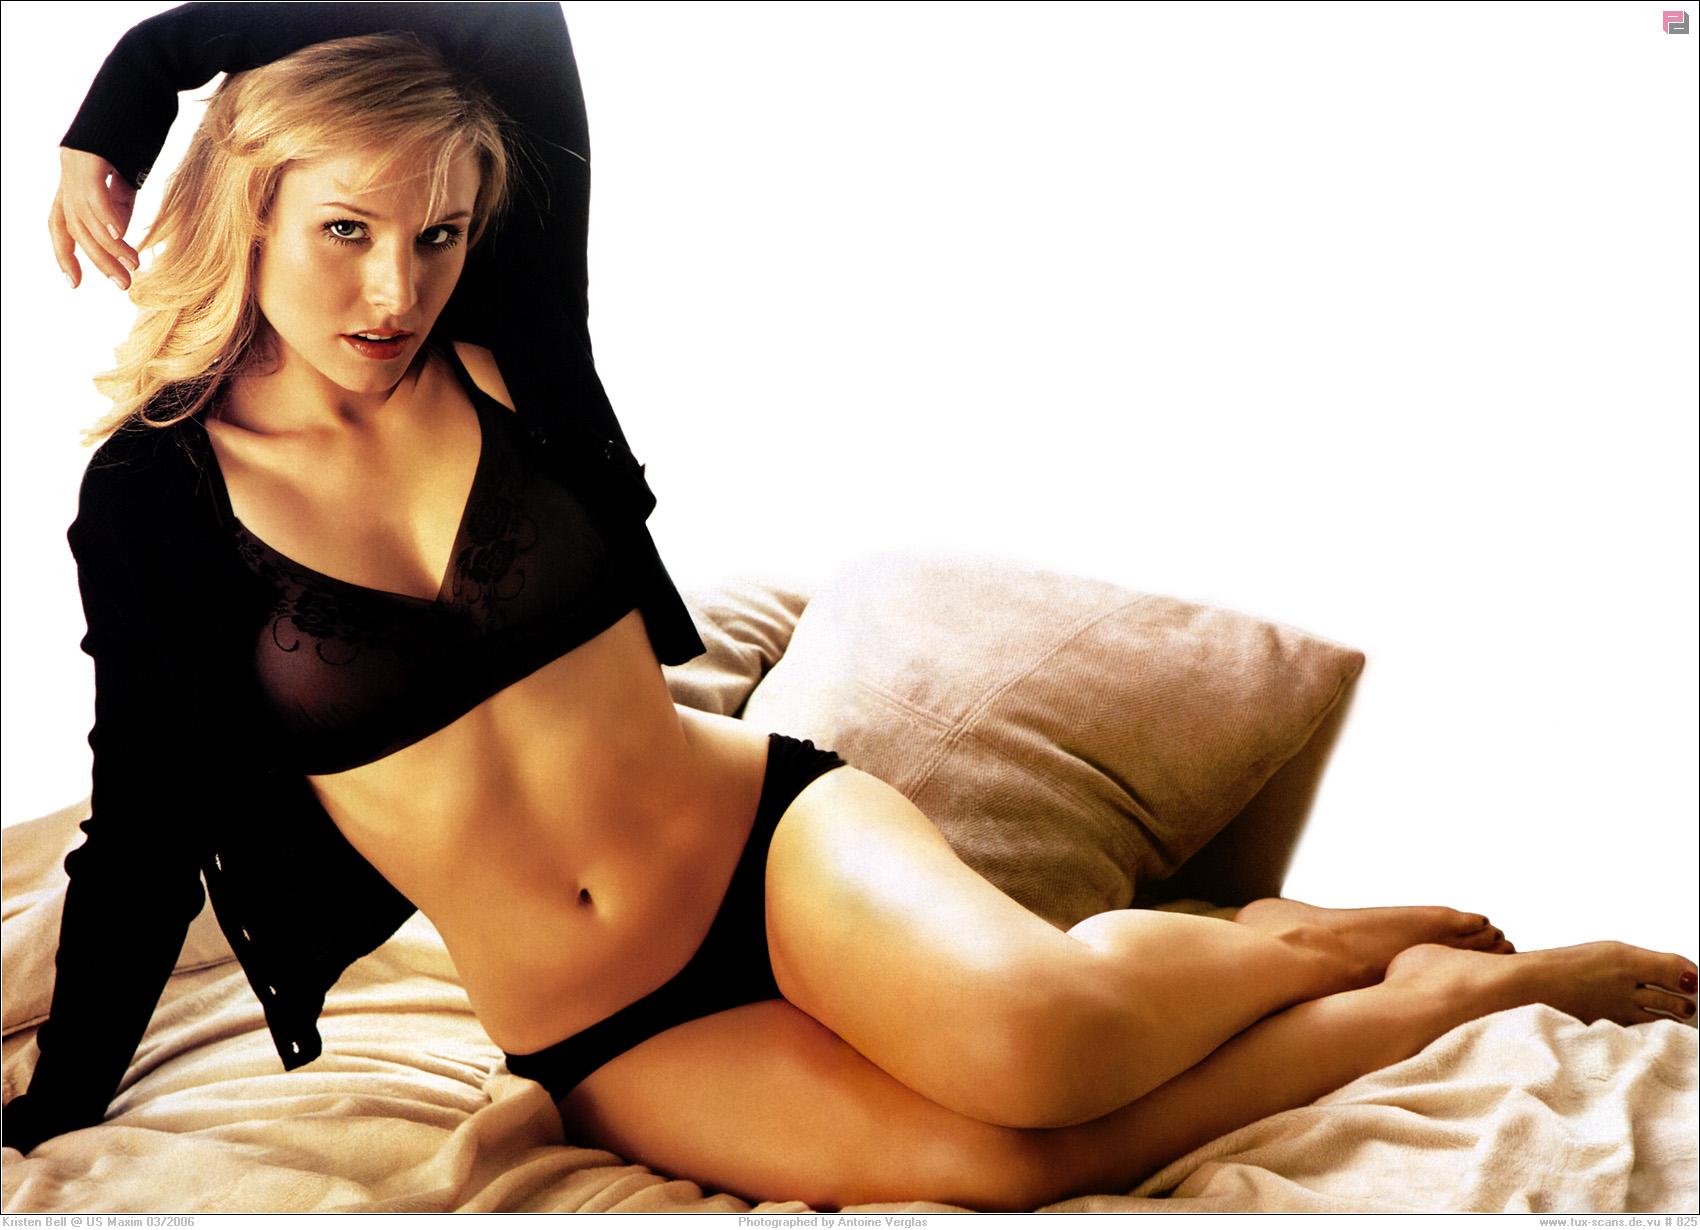 Kristen bell legs nude photos free